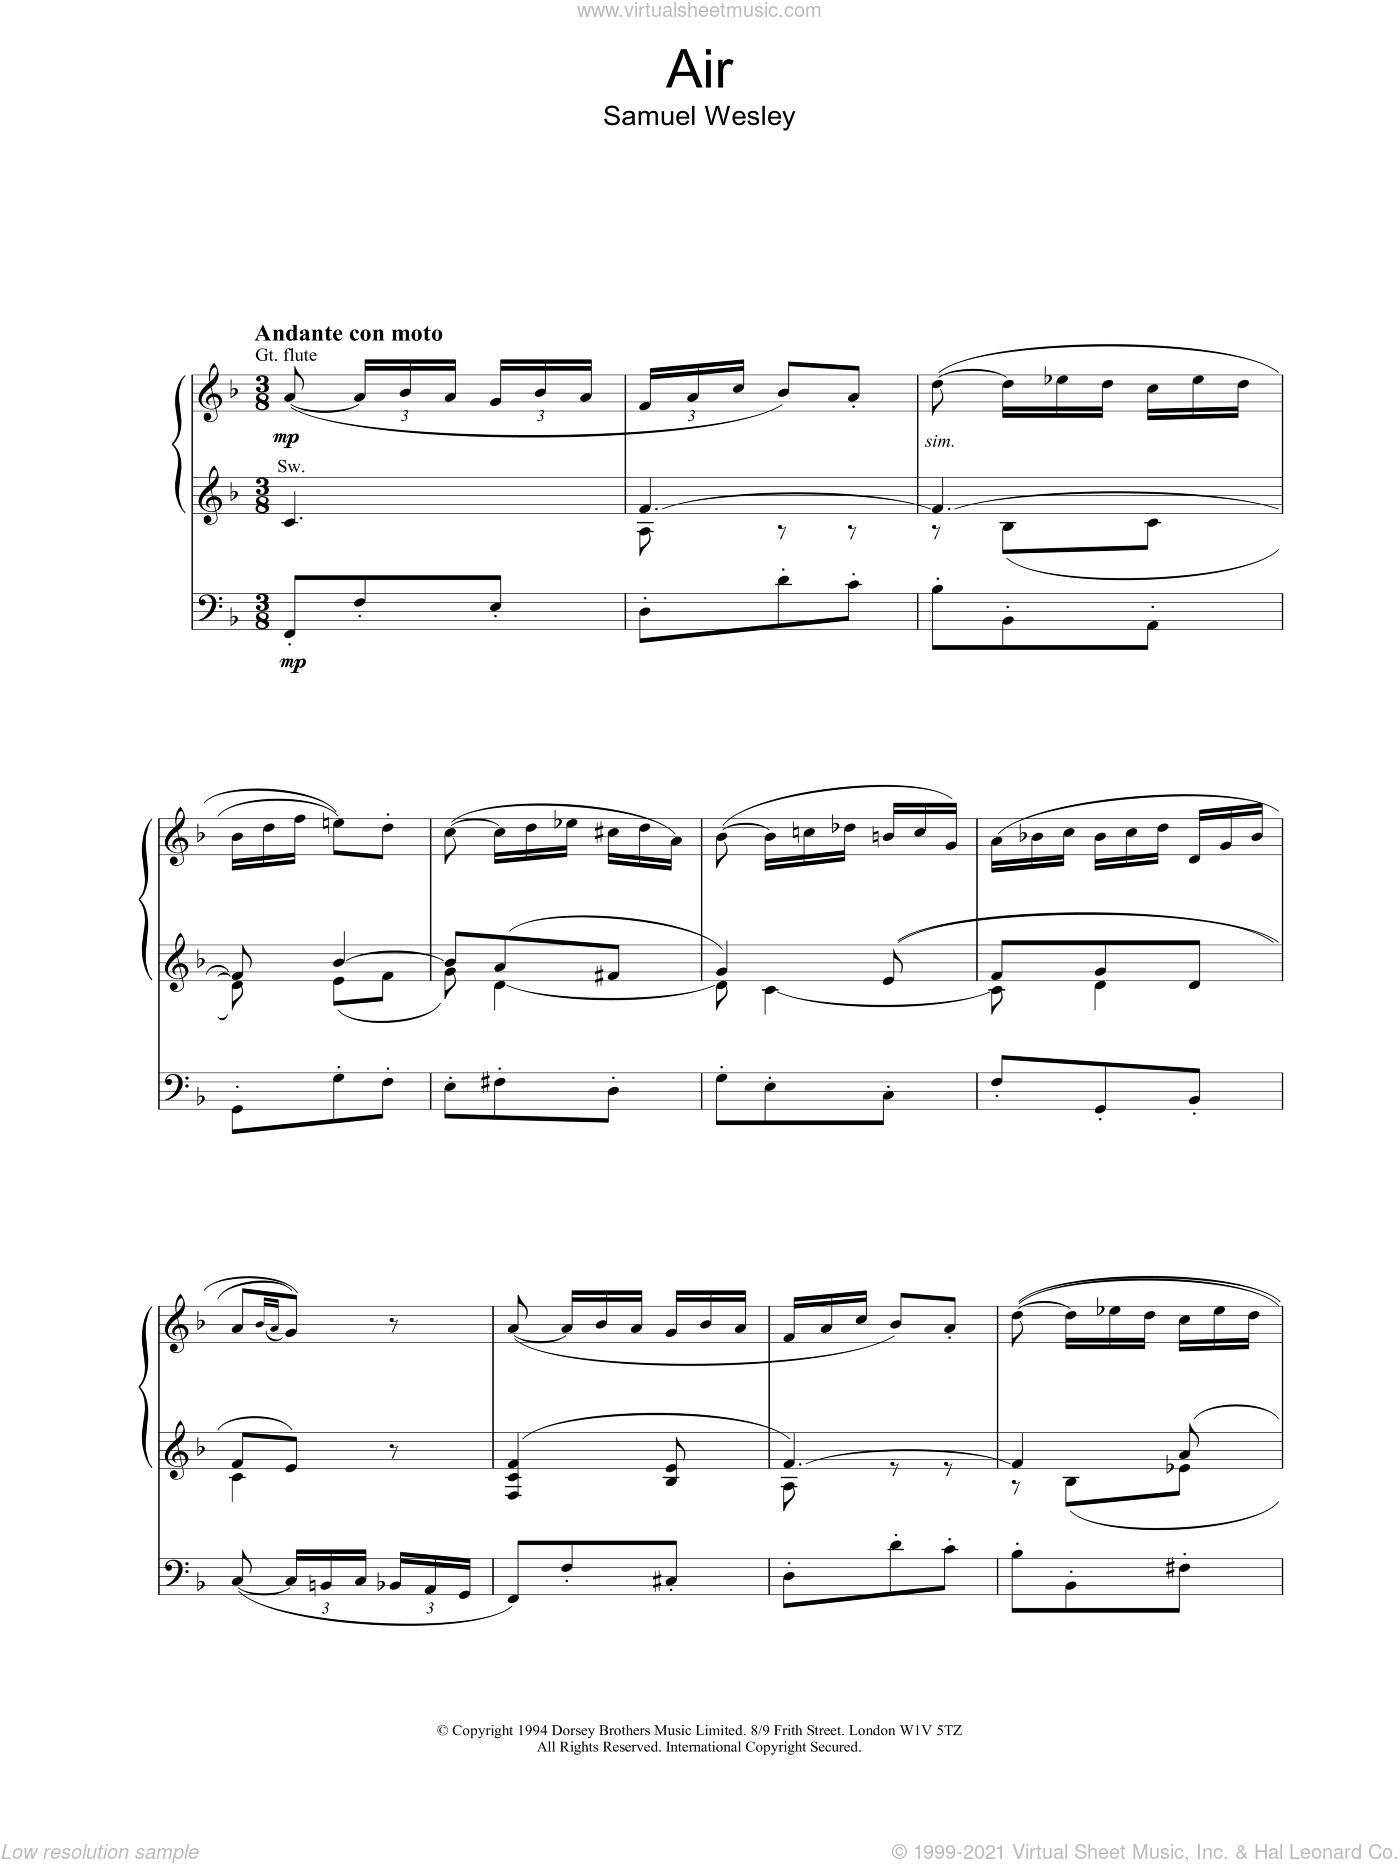 Wesley - Air sheet music for organ [PDF]